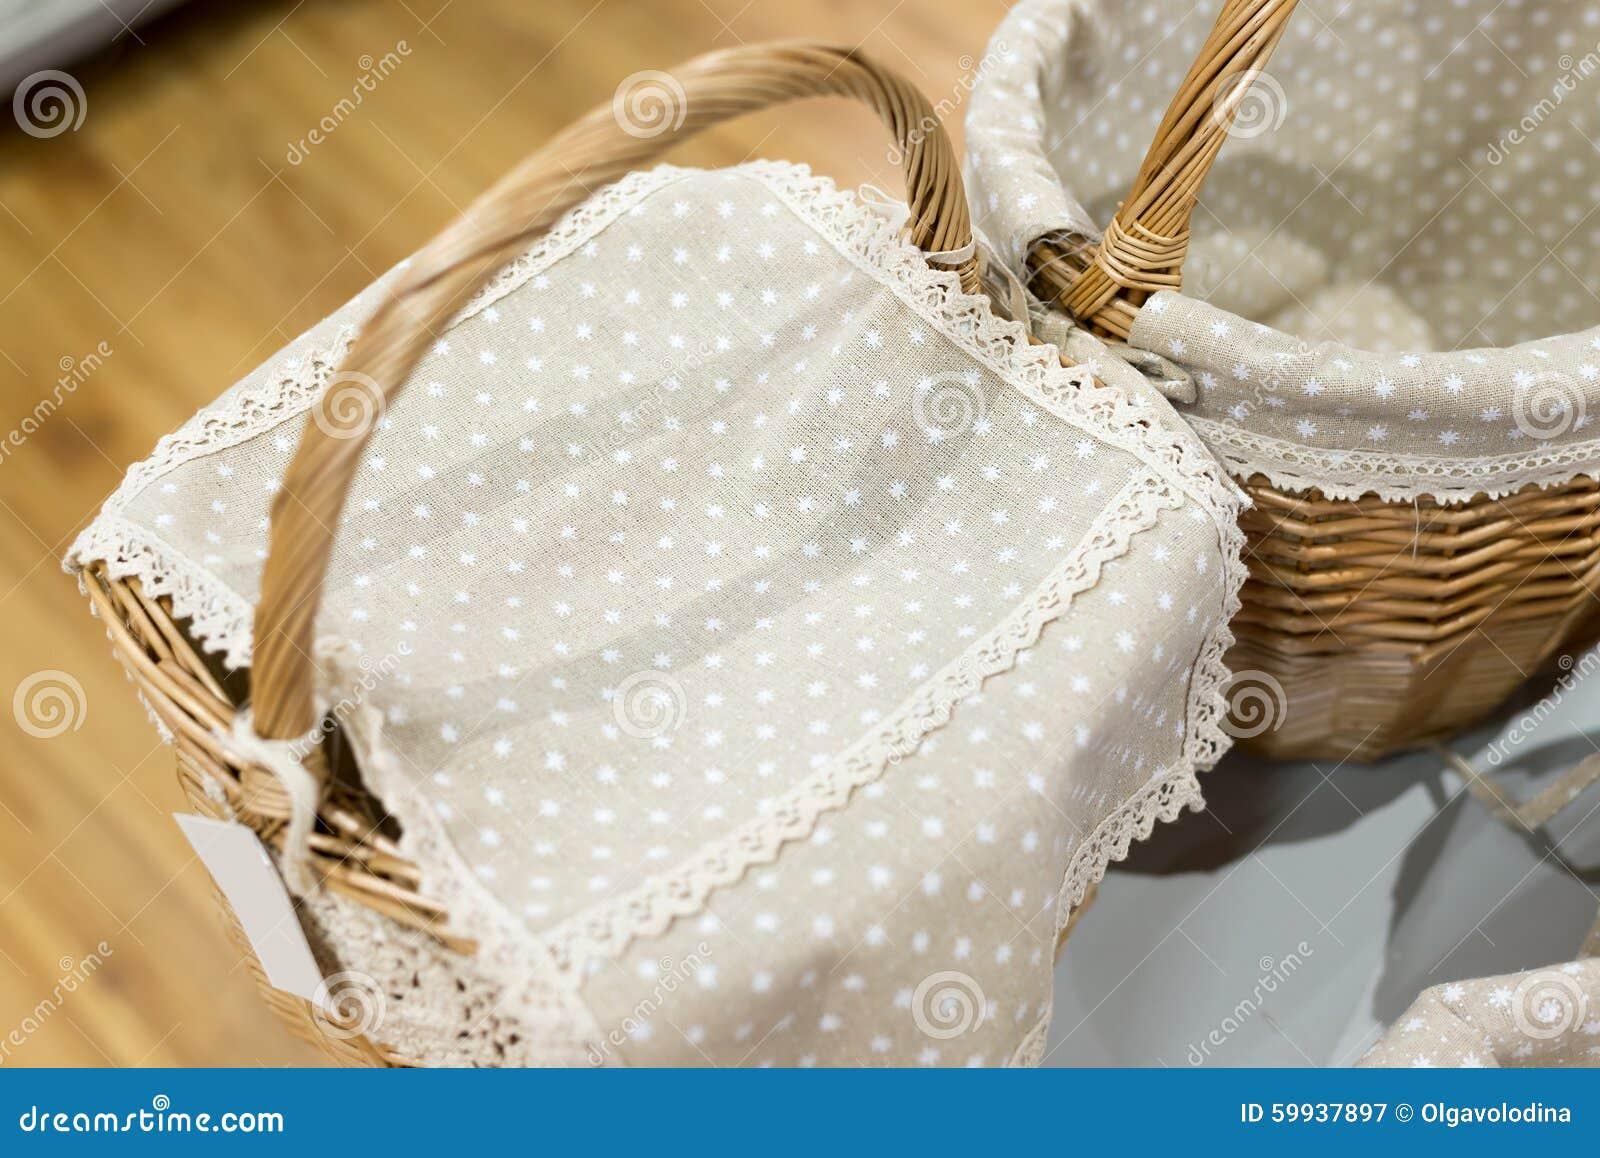 плетеная корзина покрытая с тканью